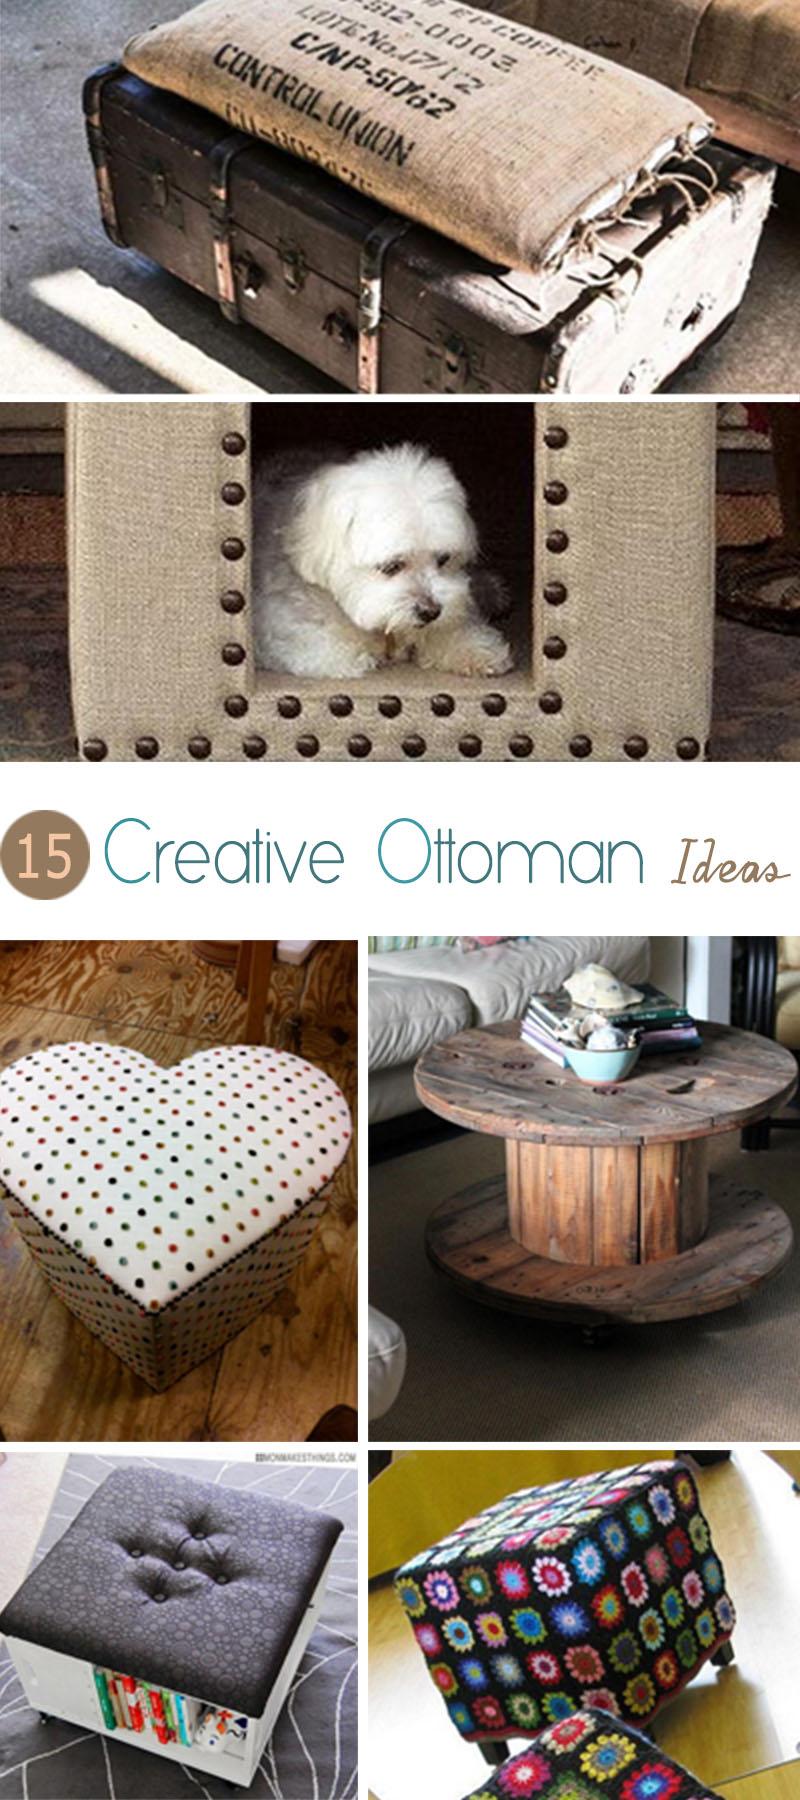 Lots of Creative Ottoman Ideas!